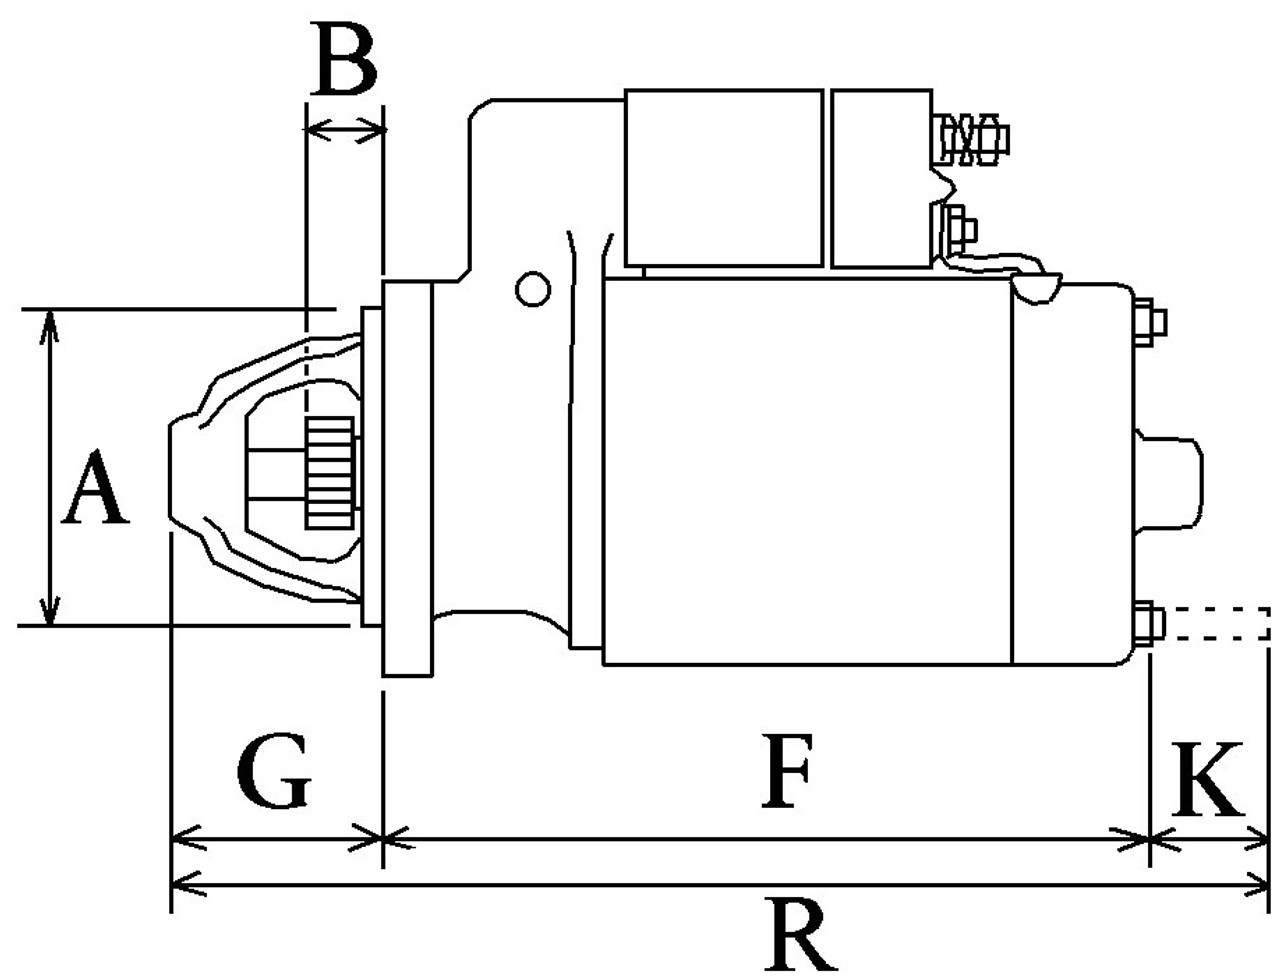 hight resolution of 3gm30f yanmar starter motor wiring diagram yanmar 3gm30f partsyanmar 3gm30 starter motor on yanmar 3gm30f parts